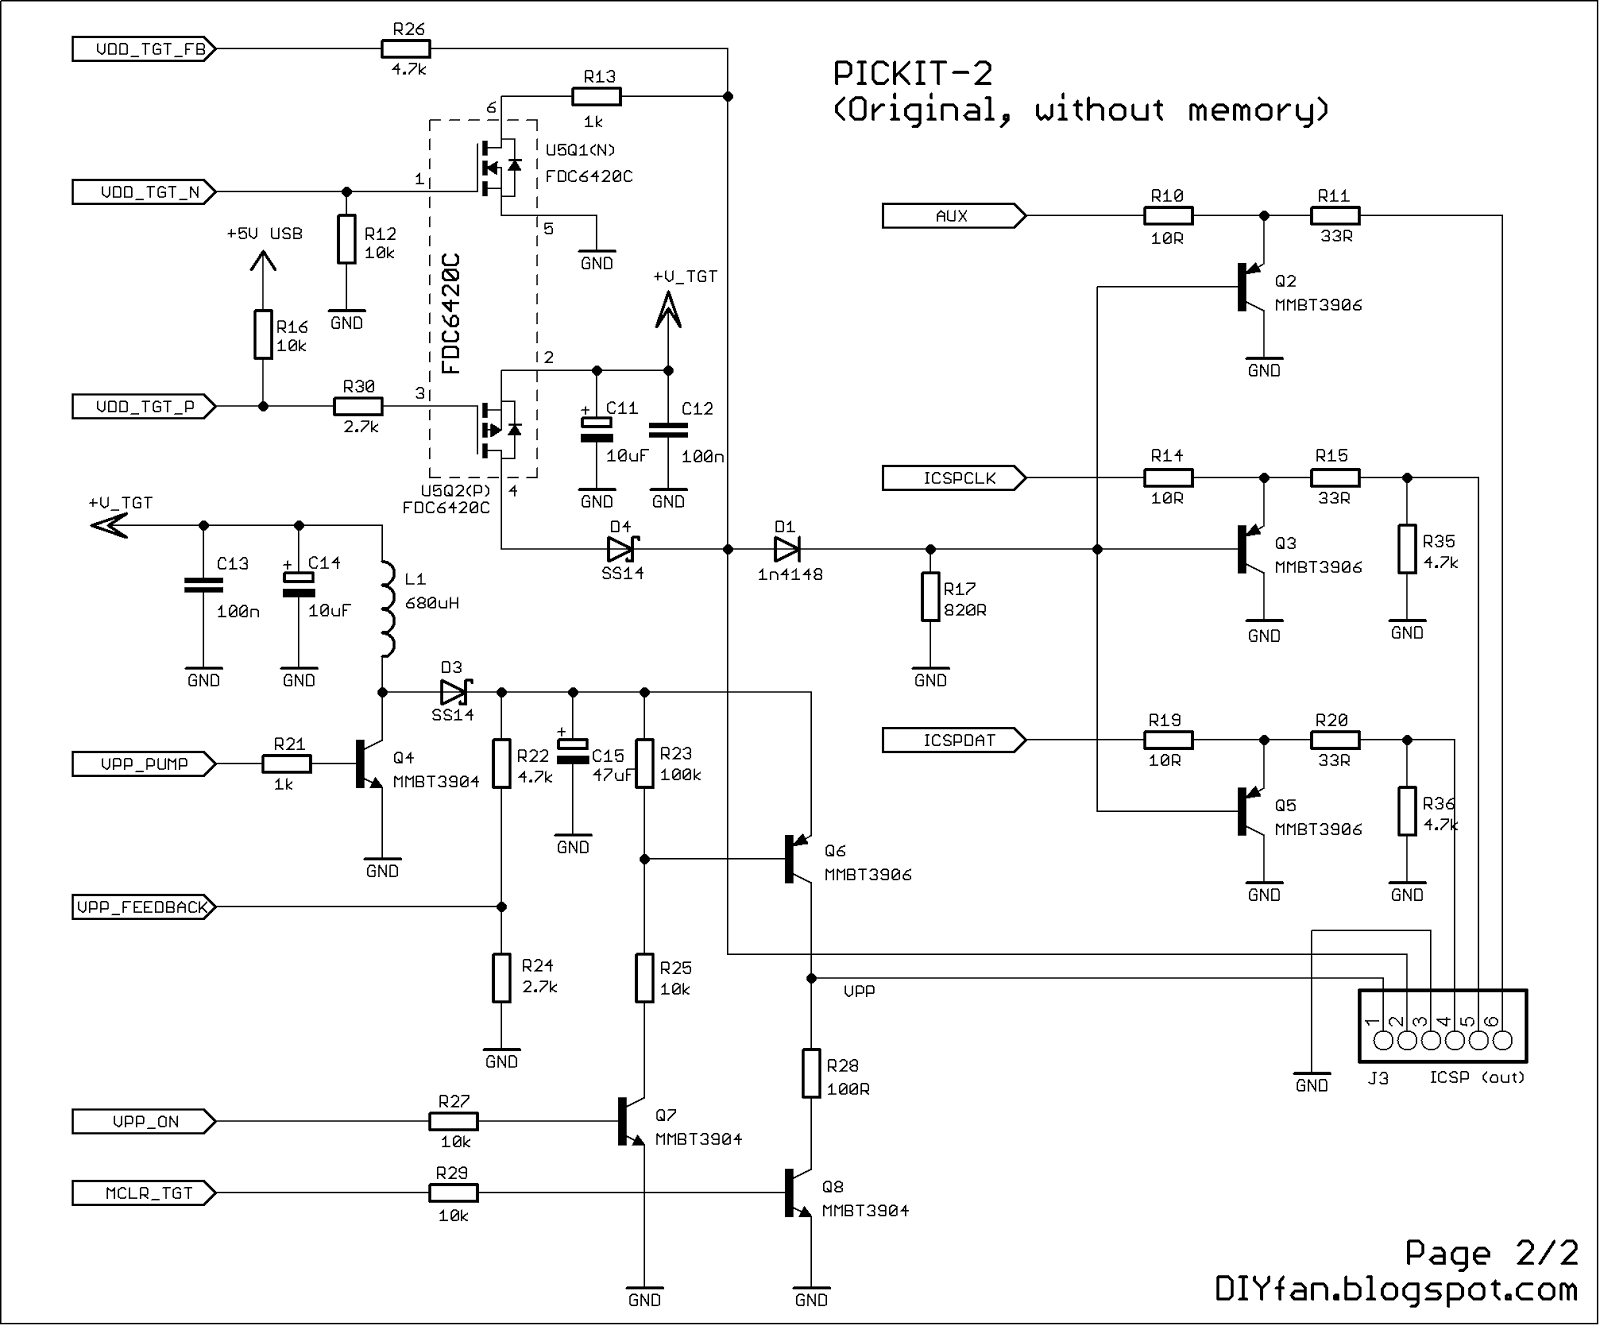 pickit 1 circuit diagram wiring diagram g8 pickit logo pickit 1 circuit diagram [ 1600 x 1326 Pixel ]